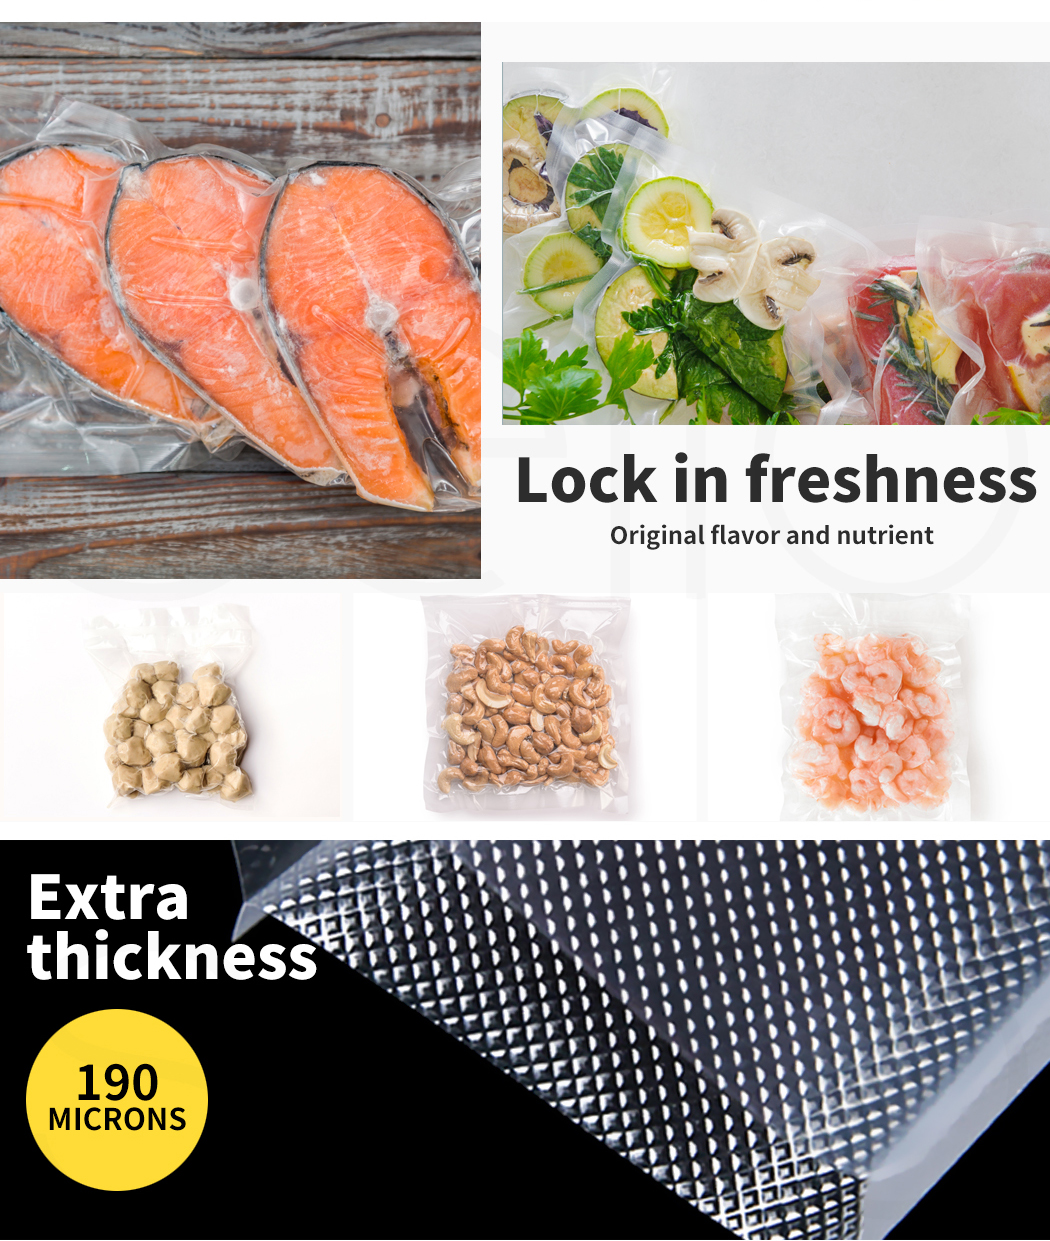 thumbnail 49 - Vacuum Food Sealer Storage Bags Saver Seal Bags Commercial Heat 100/200/500x